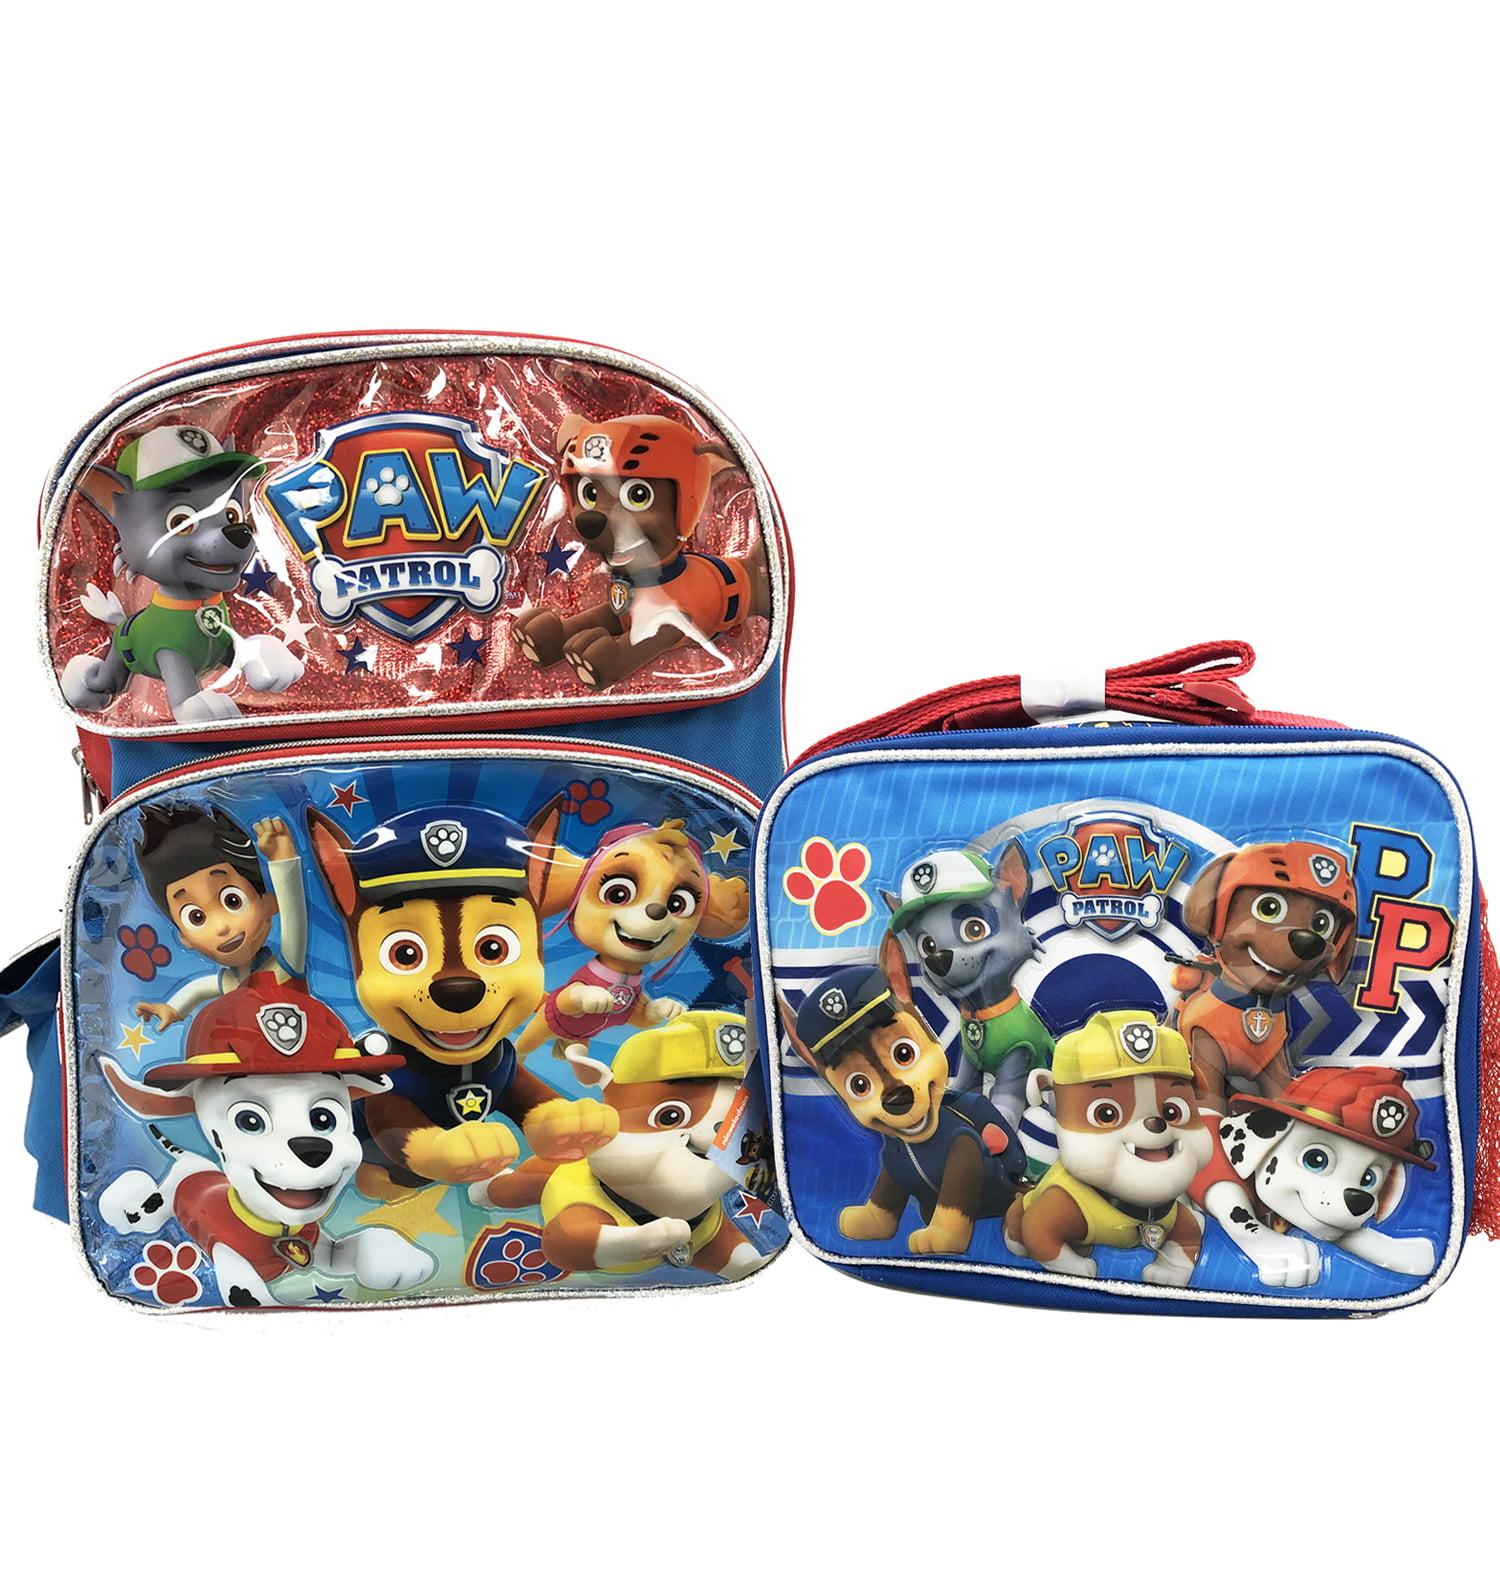 12 Paw Patrol Boys Book Bag Backpack Lunch Box Set Kids School